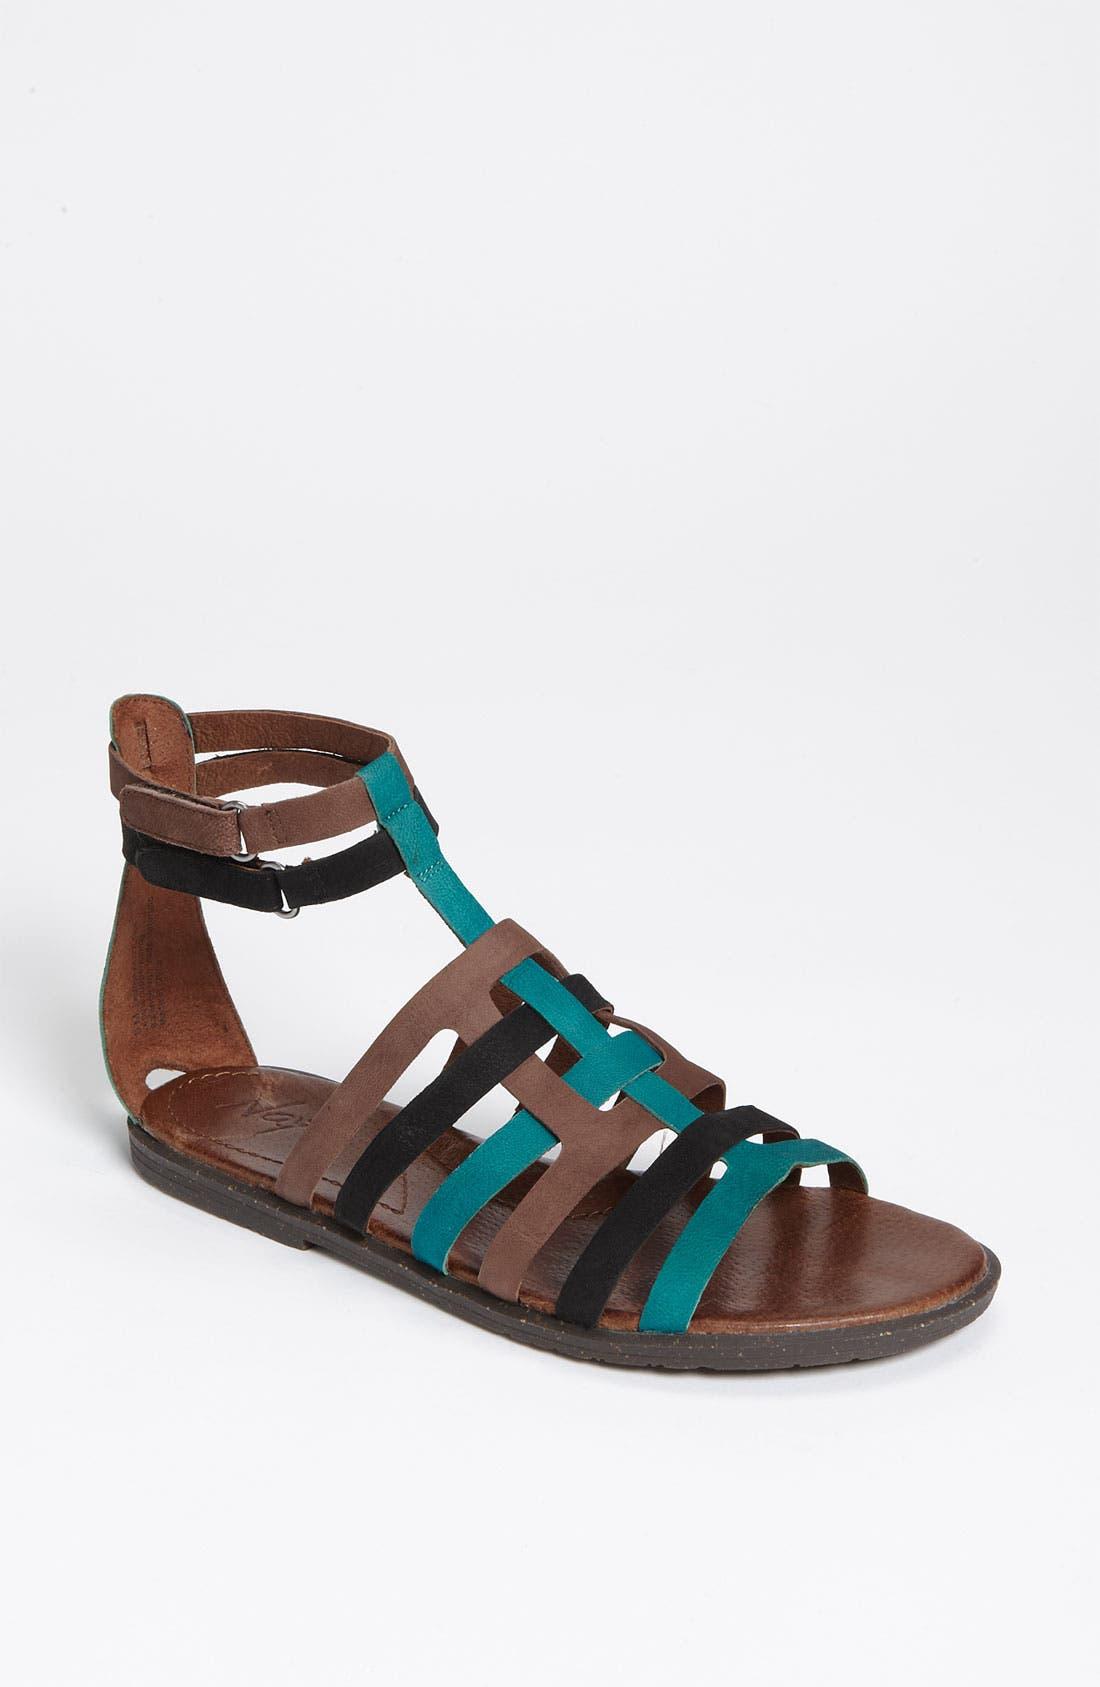 Main Image - Naya 'Zamira' Sandal